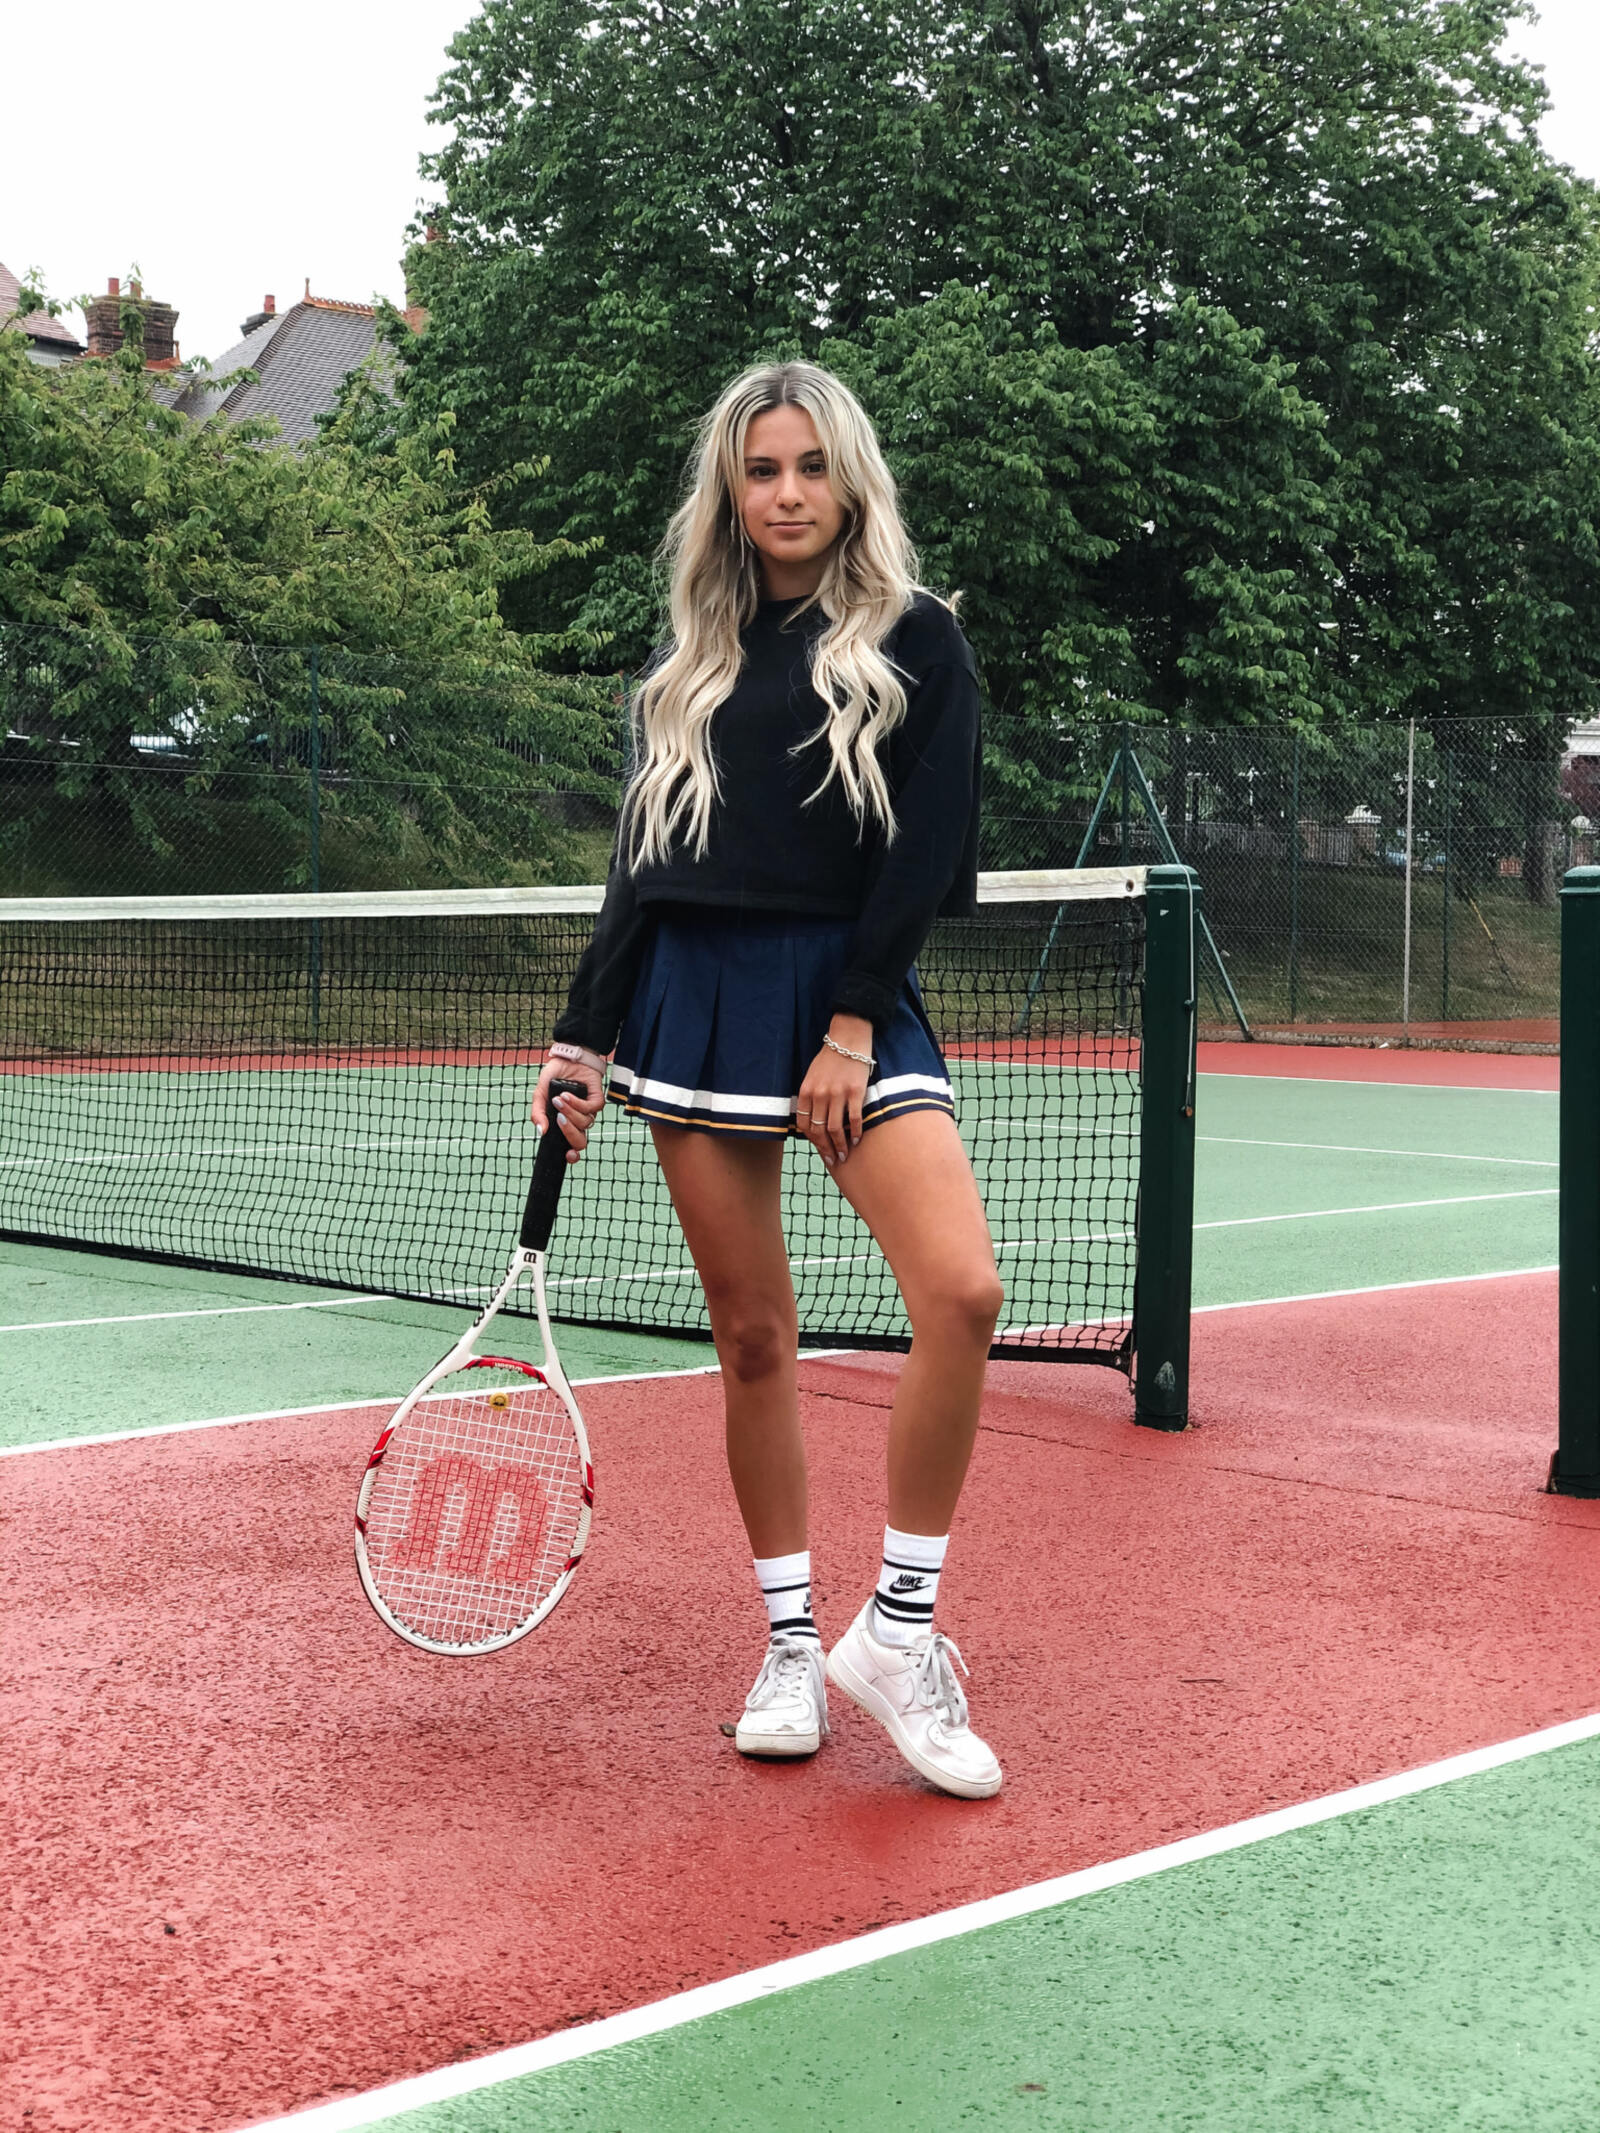 yasmin stefanie tennis court skirt style